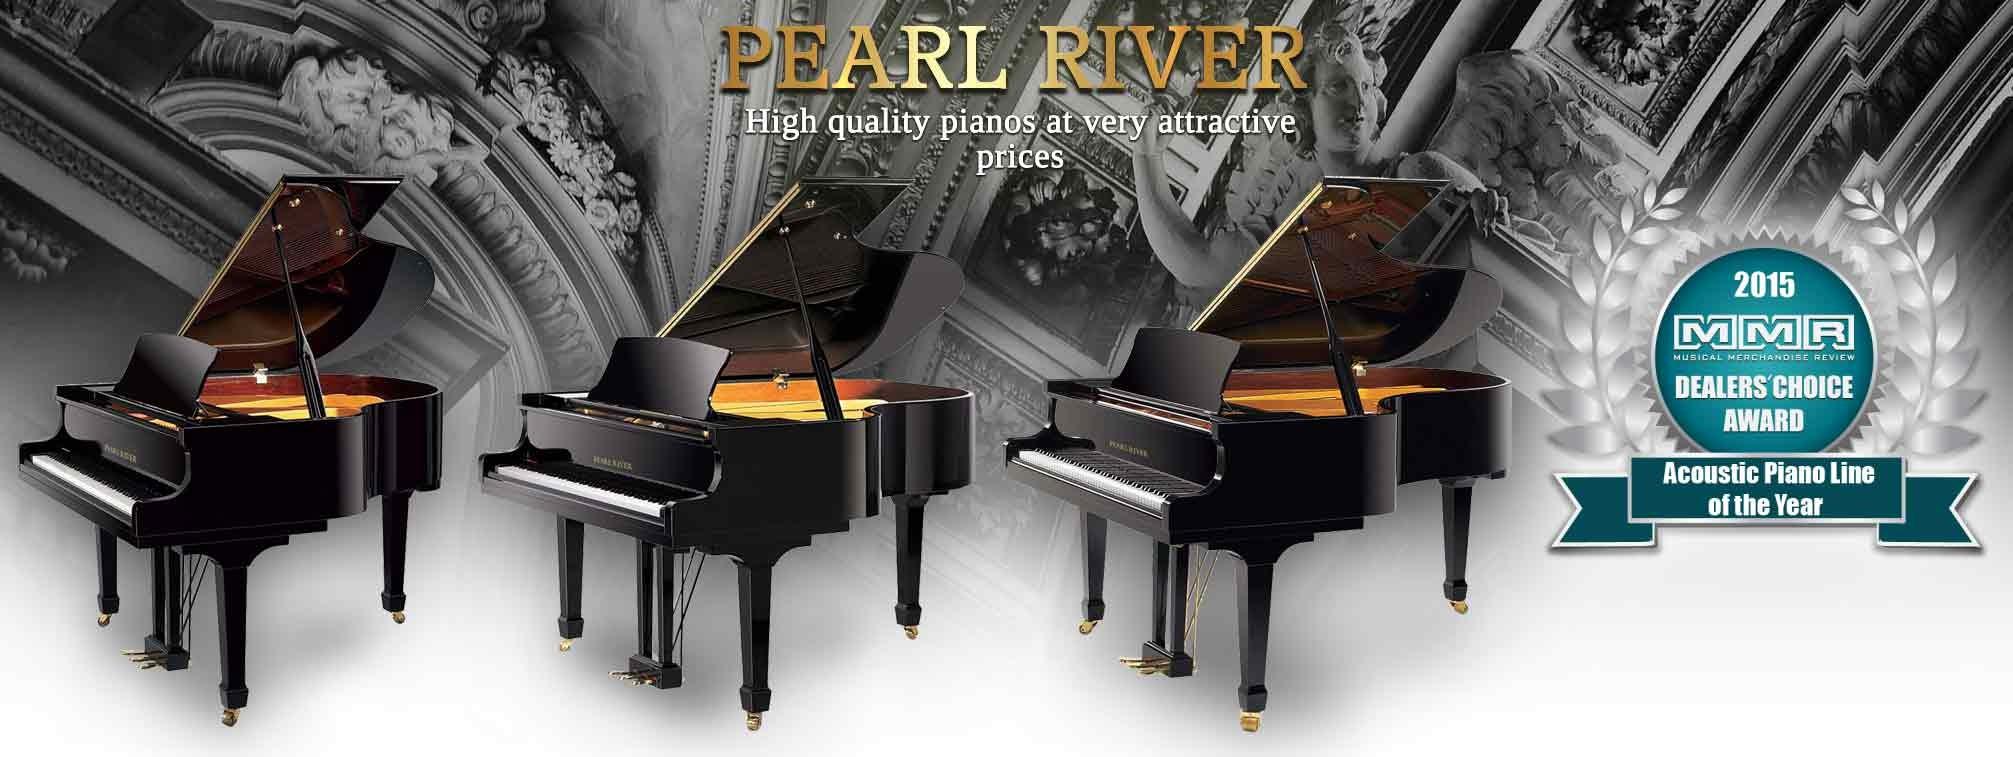 Acoustic pianos